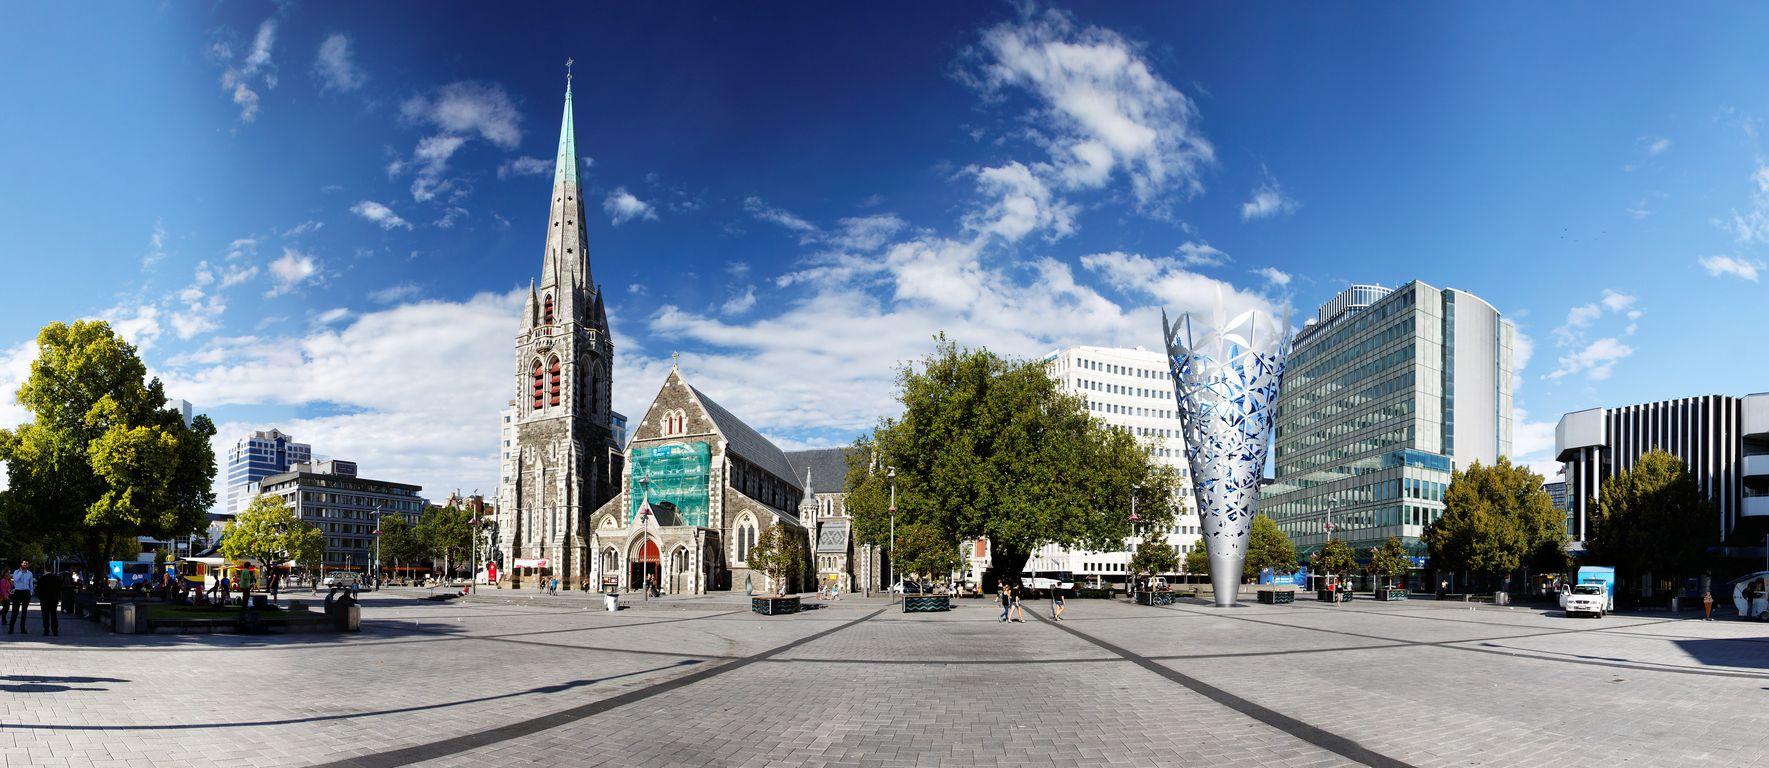 New Zealand's worst earthquake ...